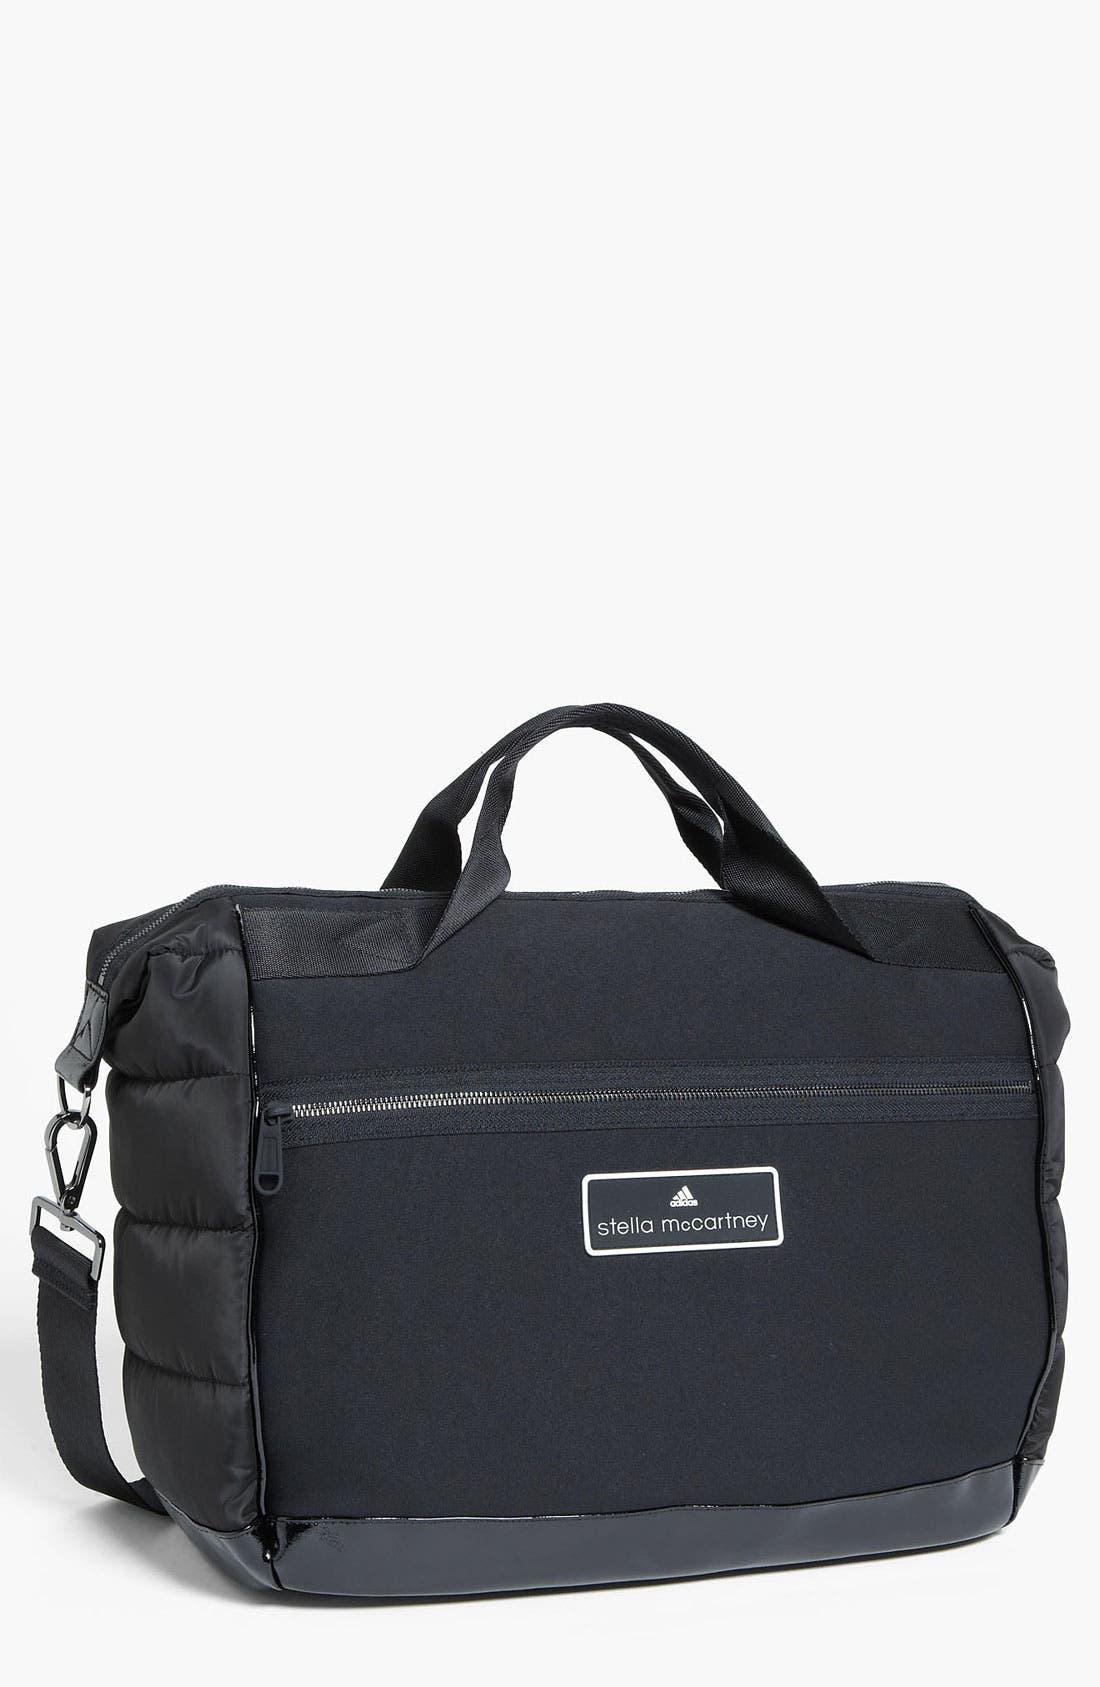 Alternate Image 1 Selected - adidas by Stella McCartney 'Fashion' Duffel Bag